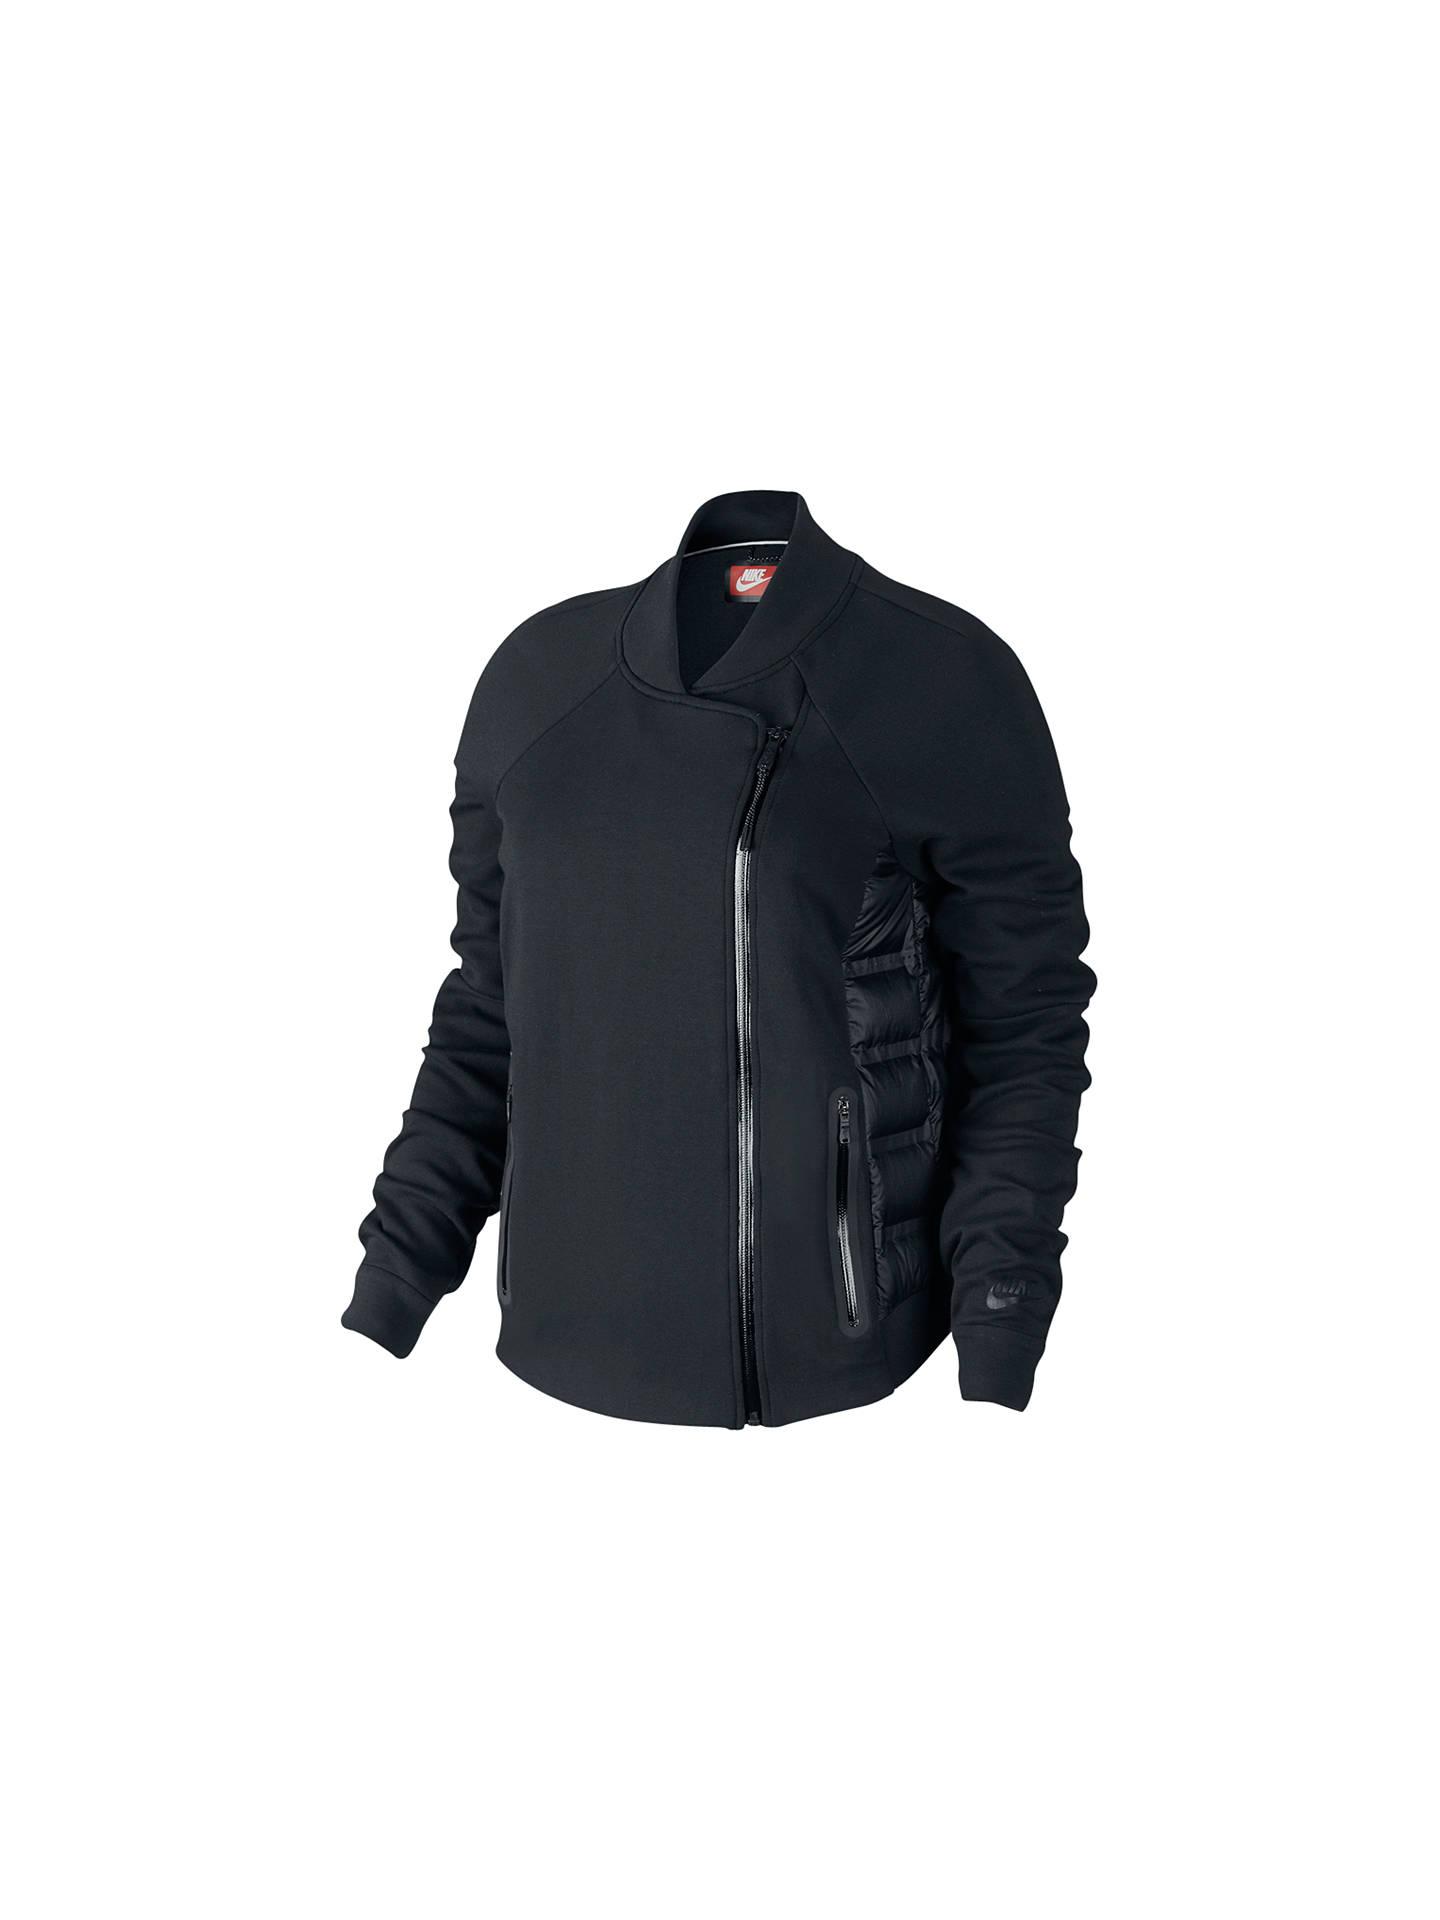 2b9f89d3 Buy Nike Tech Fleece Aeroloft Moto Jacket, Black, XS Online at  johnlewis.com ...